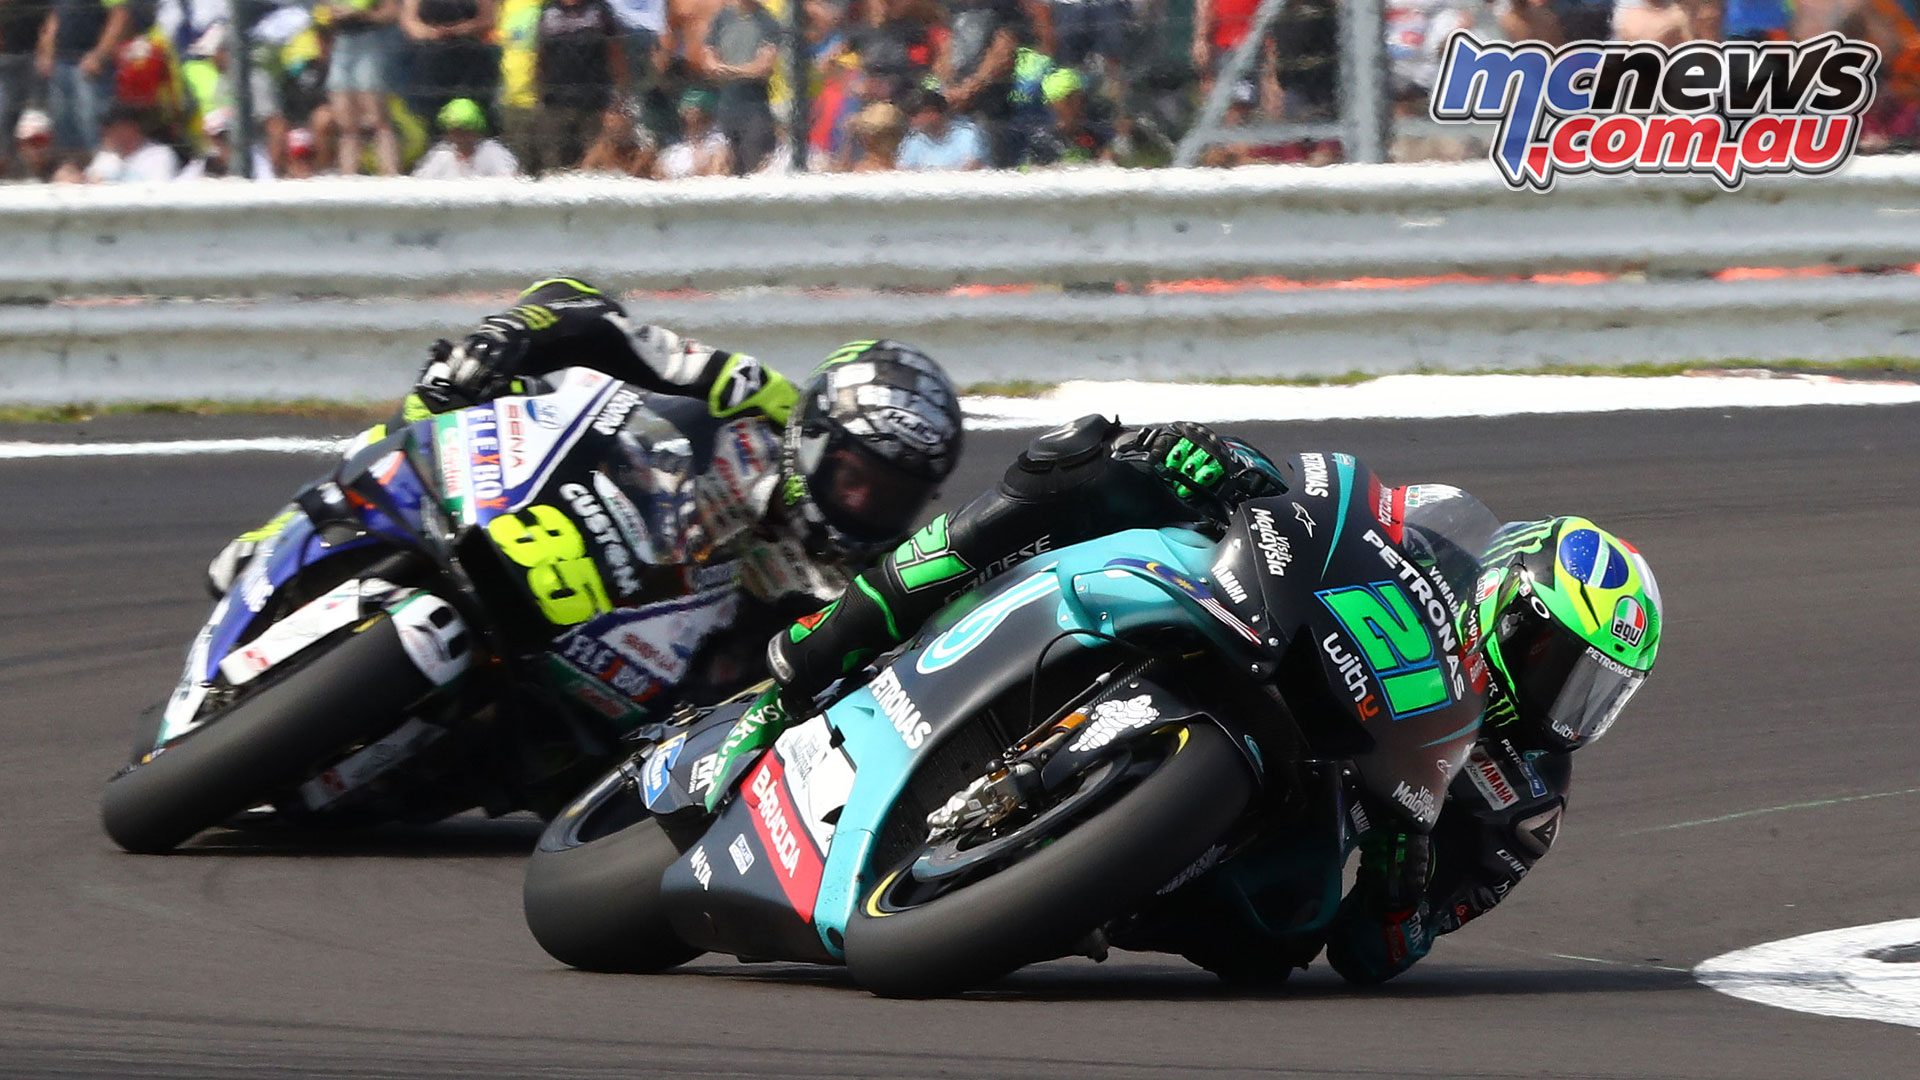 MotoGP Rnd Silverstone Morbidelli